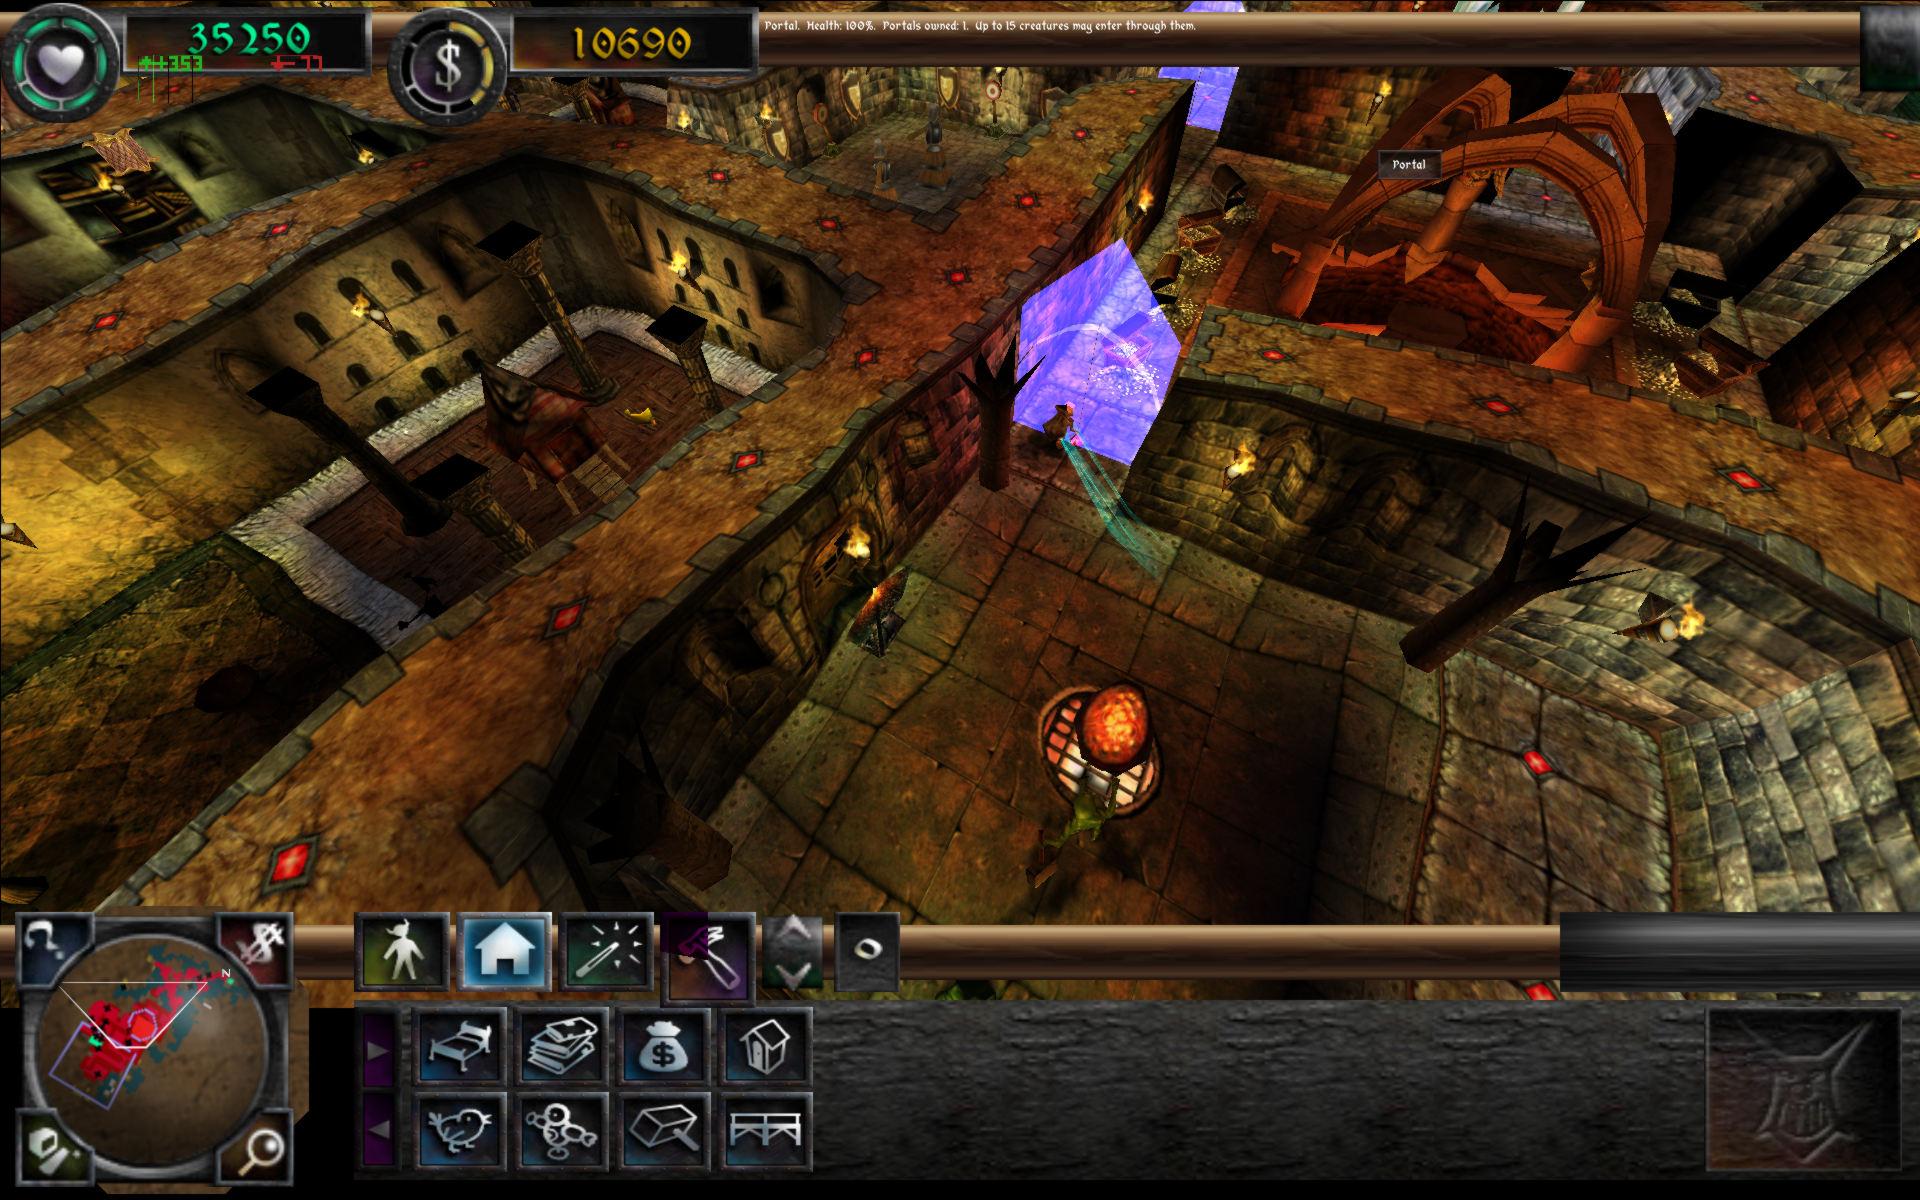 Dungeon keeper 2 | amd k6, k6-2 and k6-iii cpu resource.